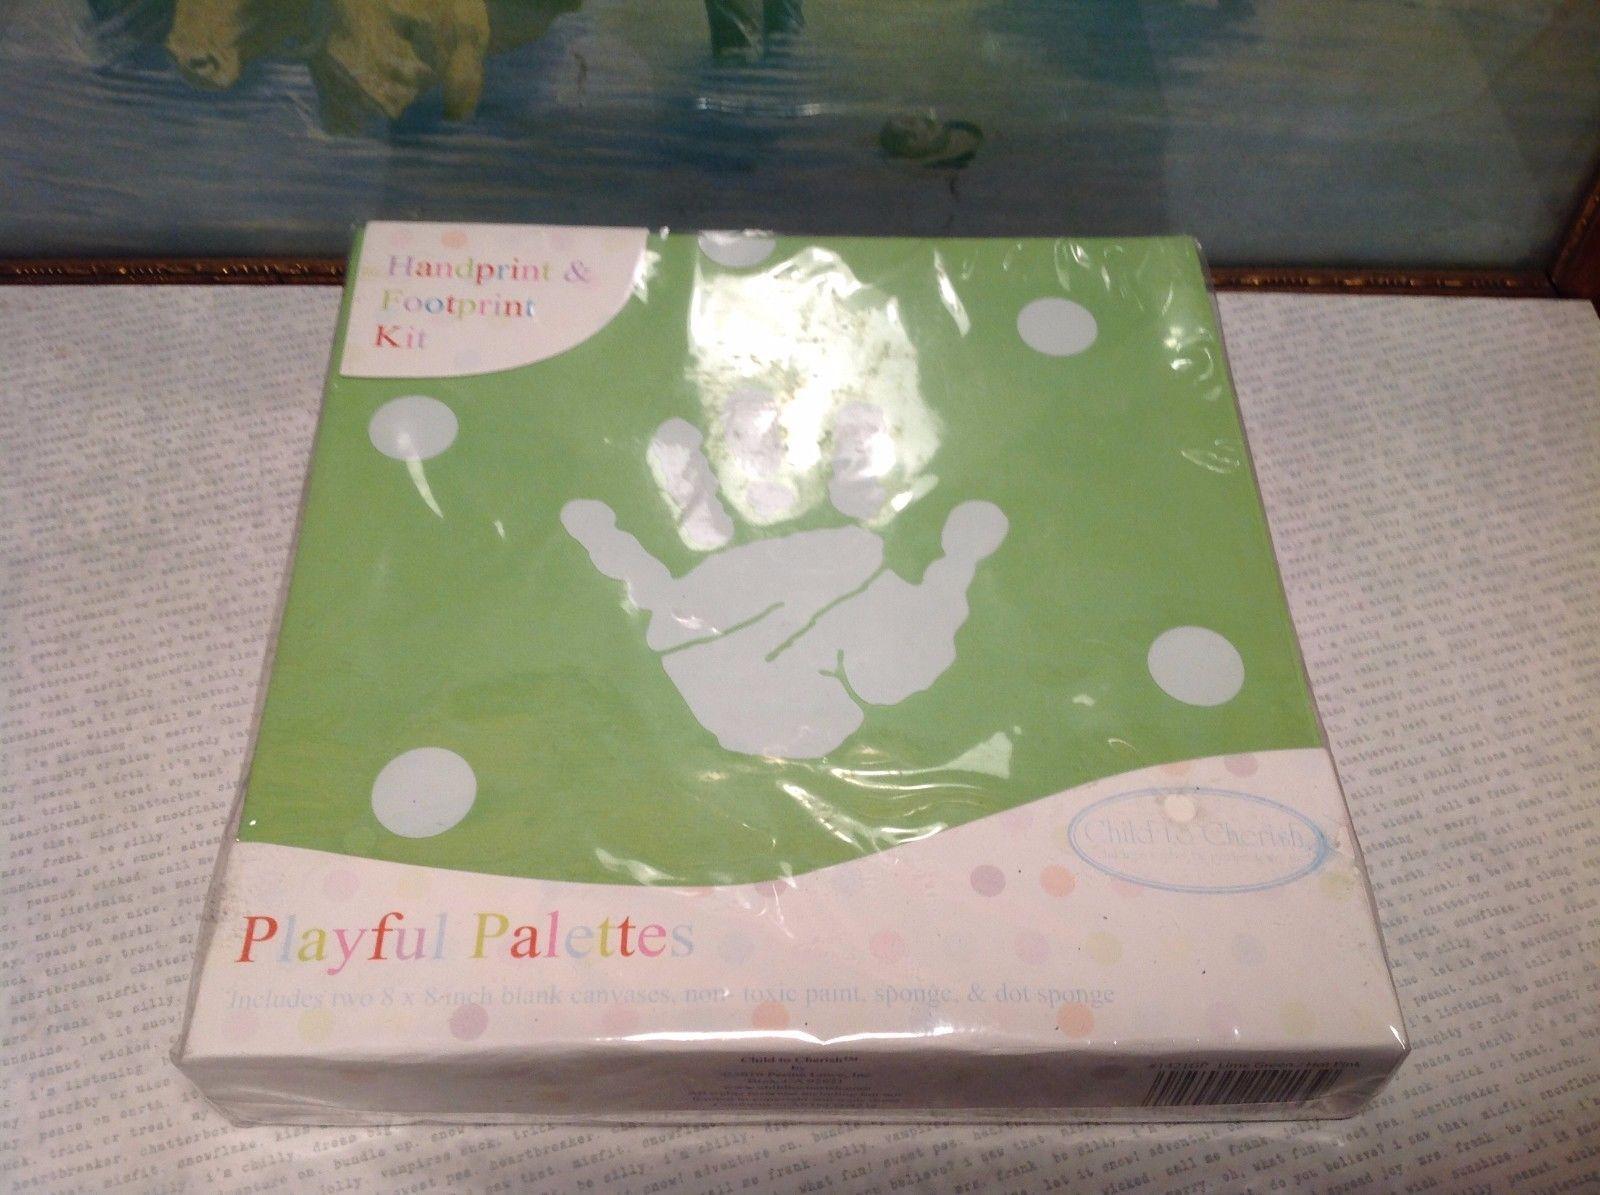 Playful Palettes Child to Cherish Hand and Footprint Kit